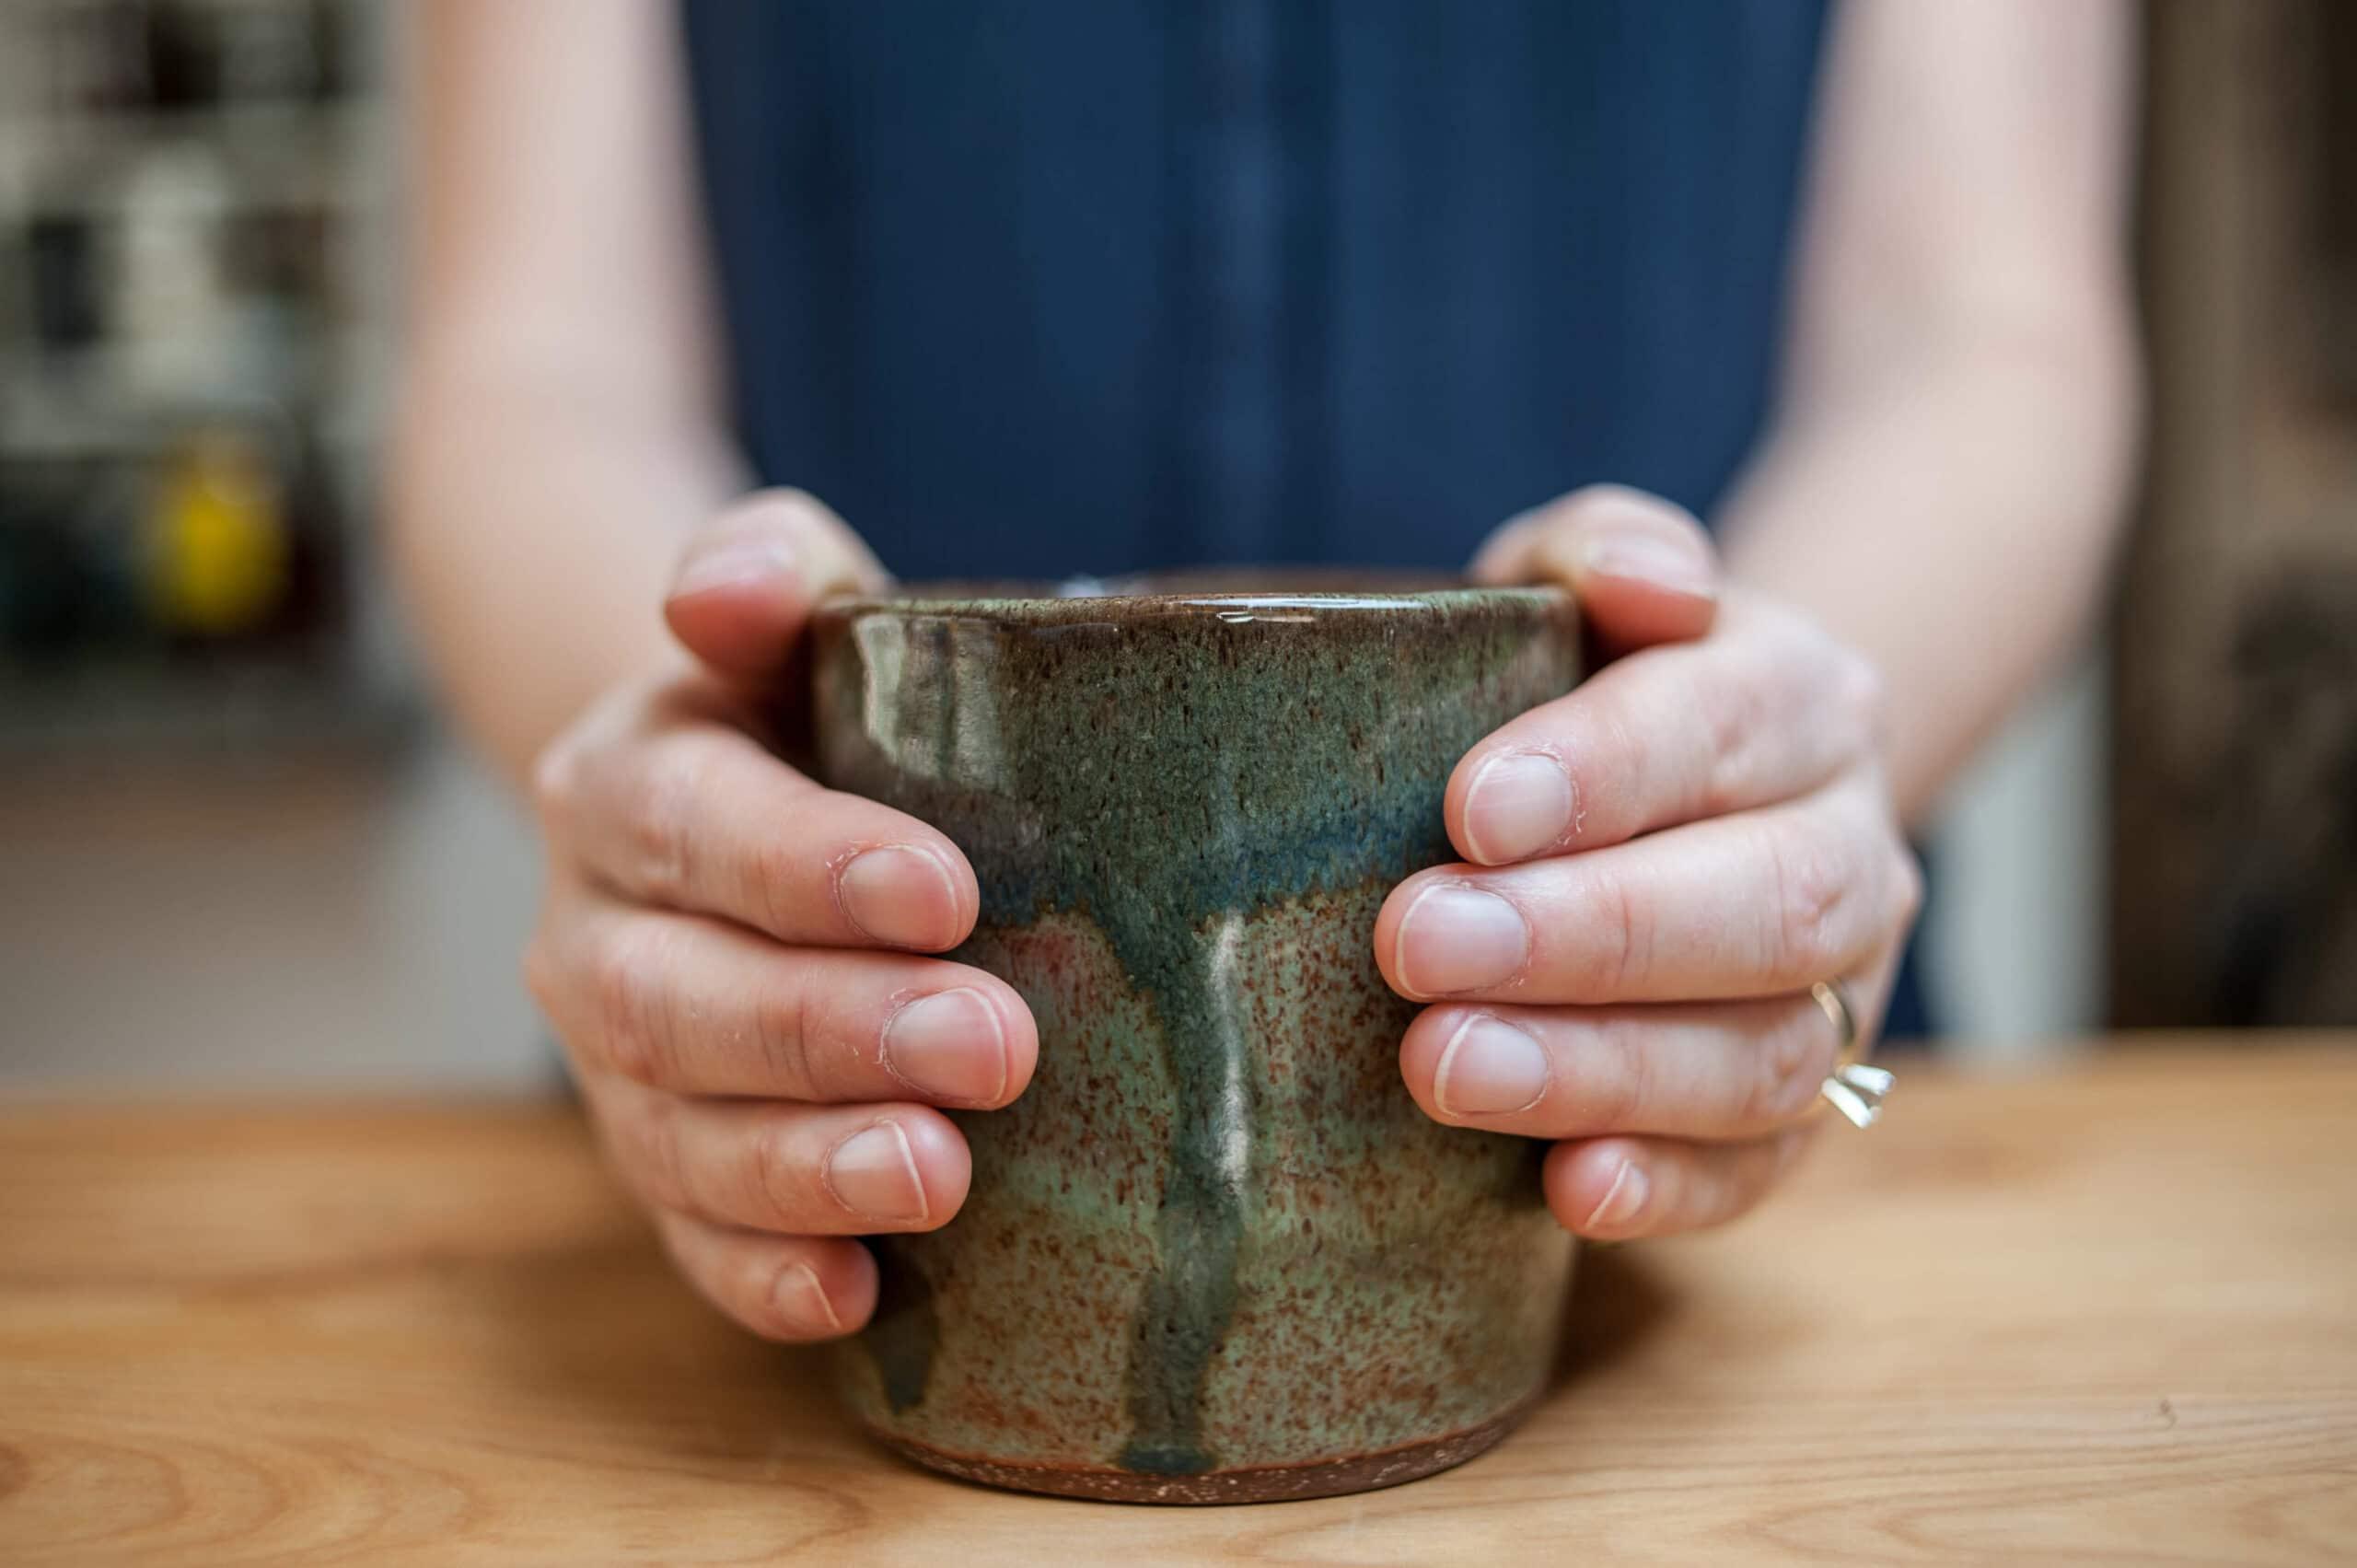 teacup analogy